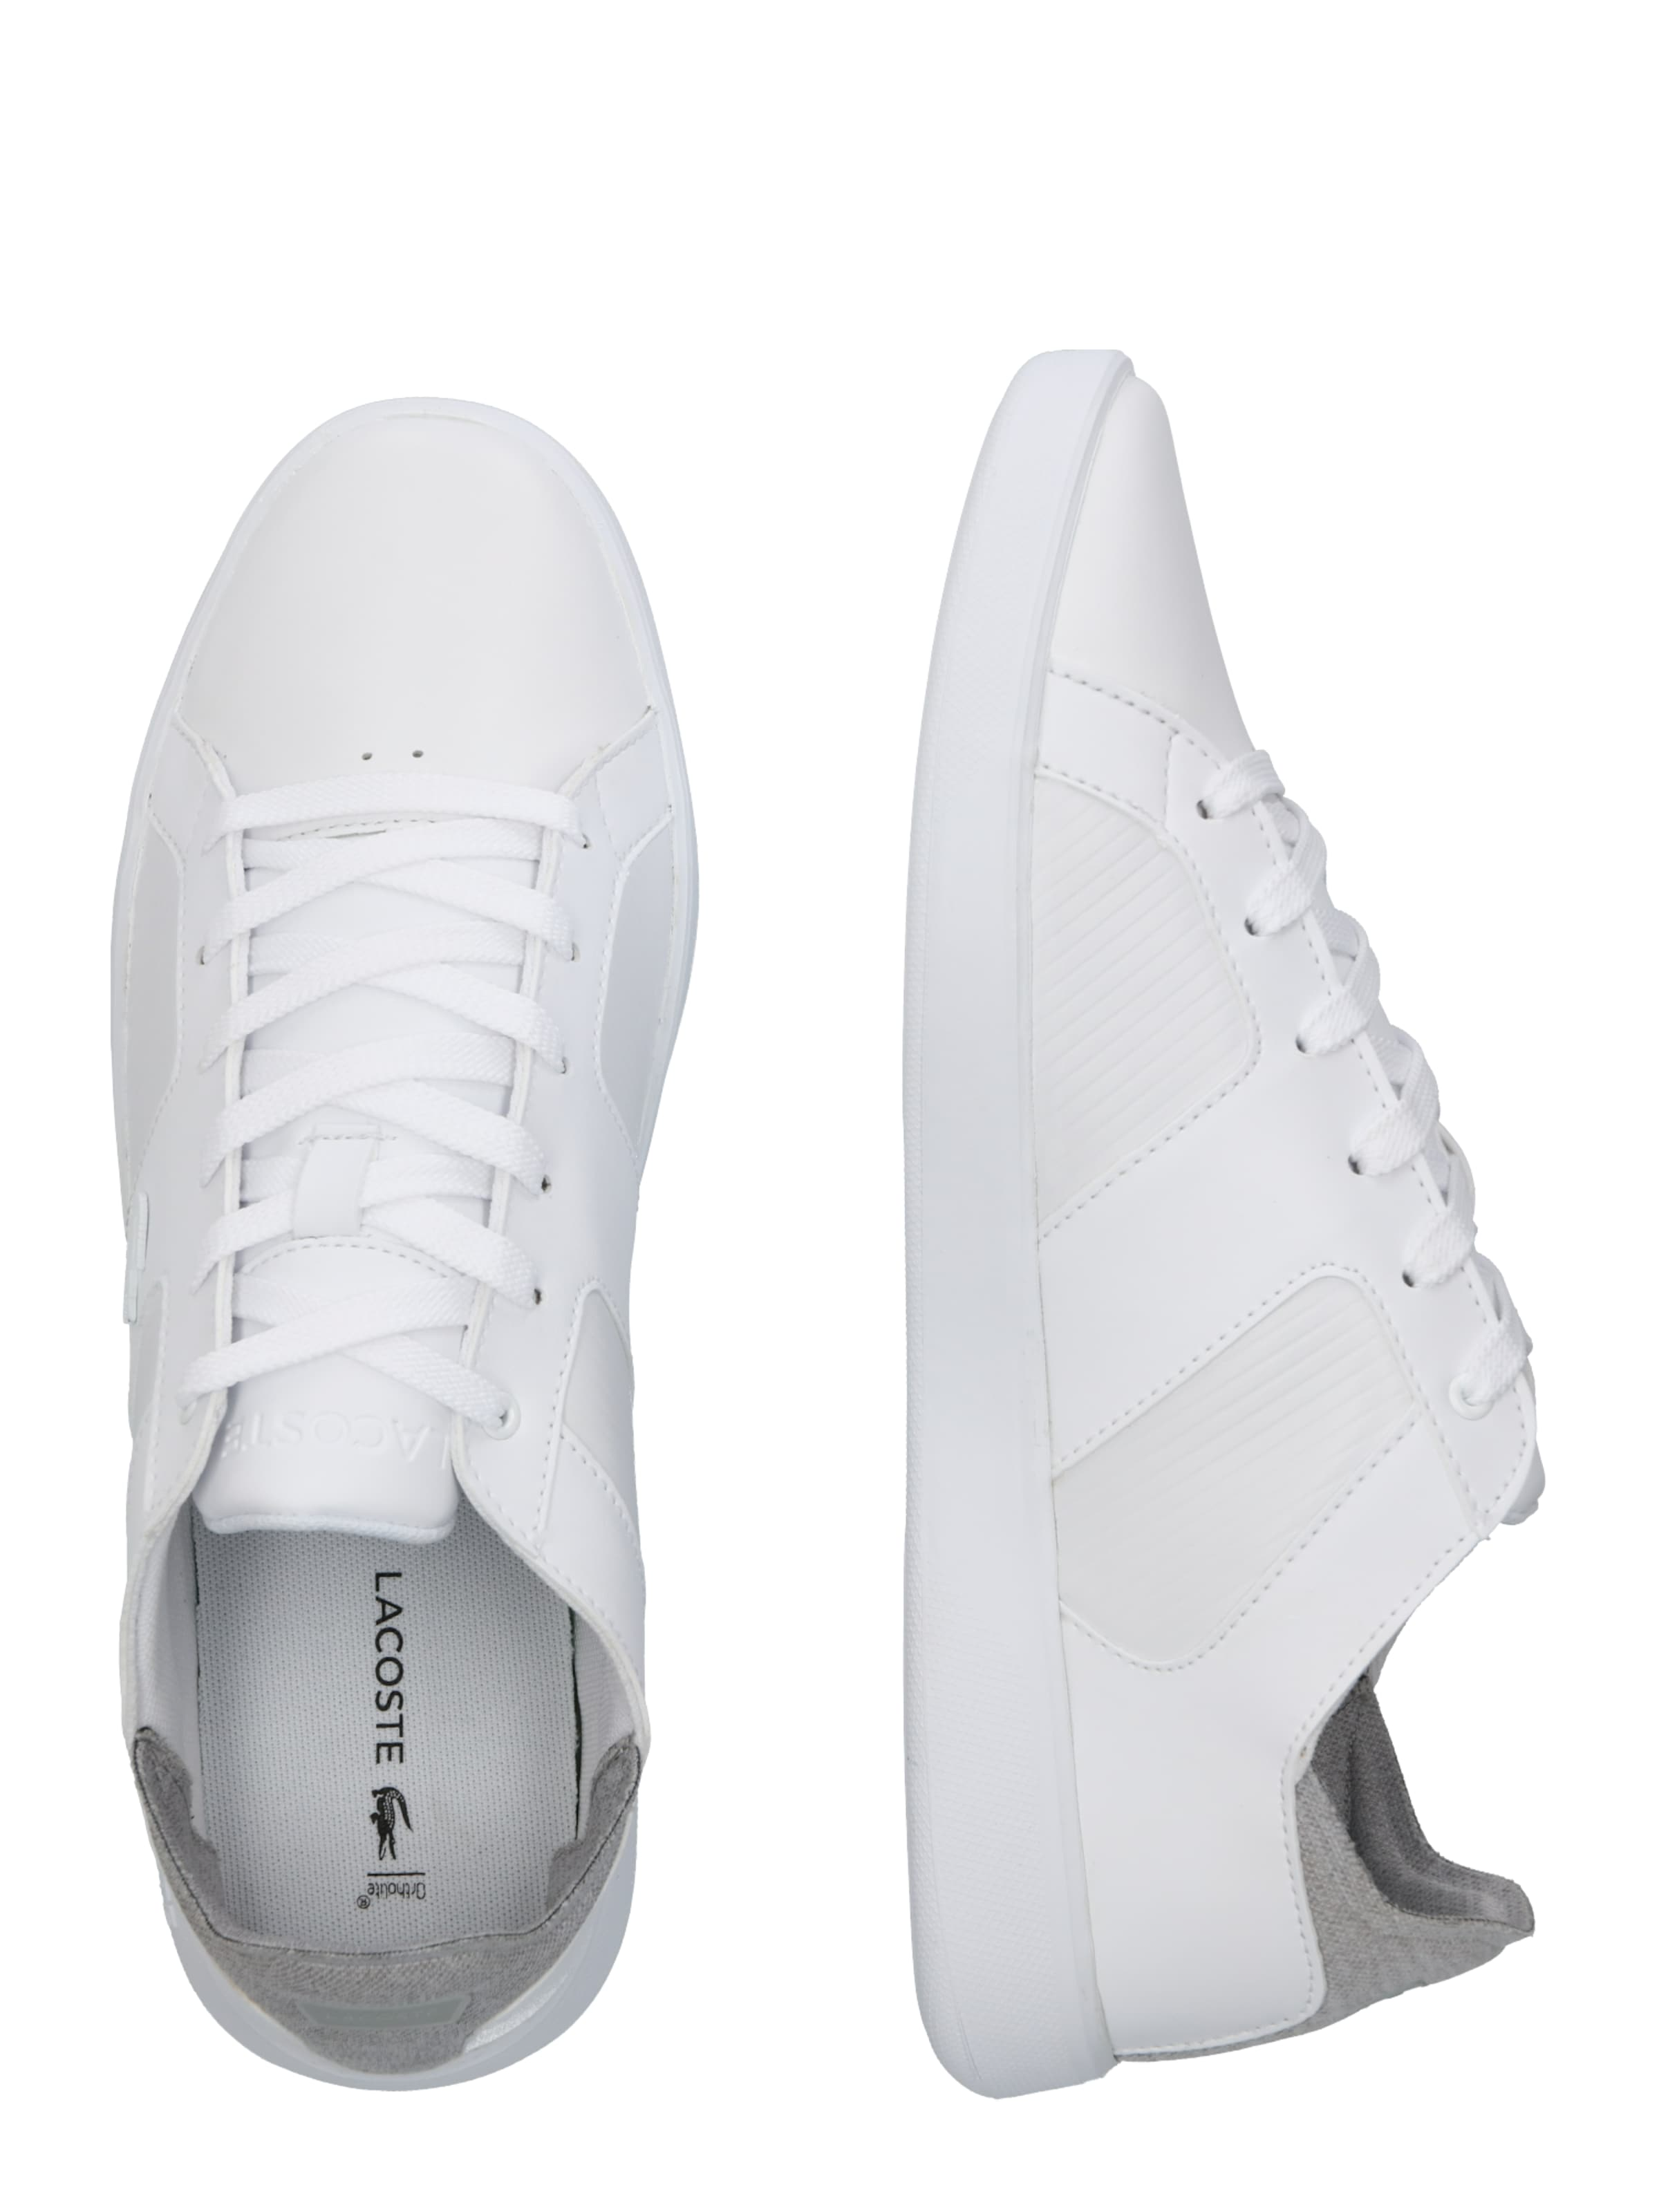 319 HellgrauWeiß 'novas Sma' Lacoste In 2 Sneaker OkPTXwuZi